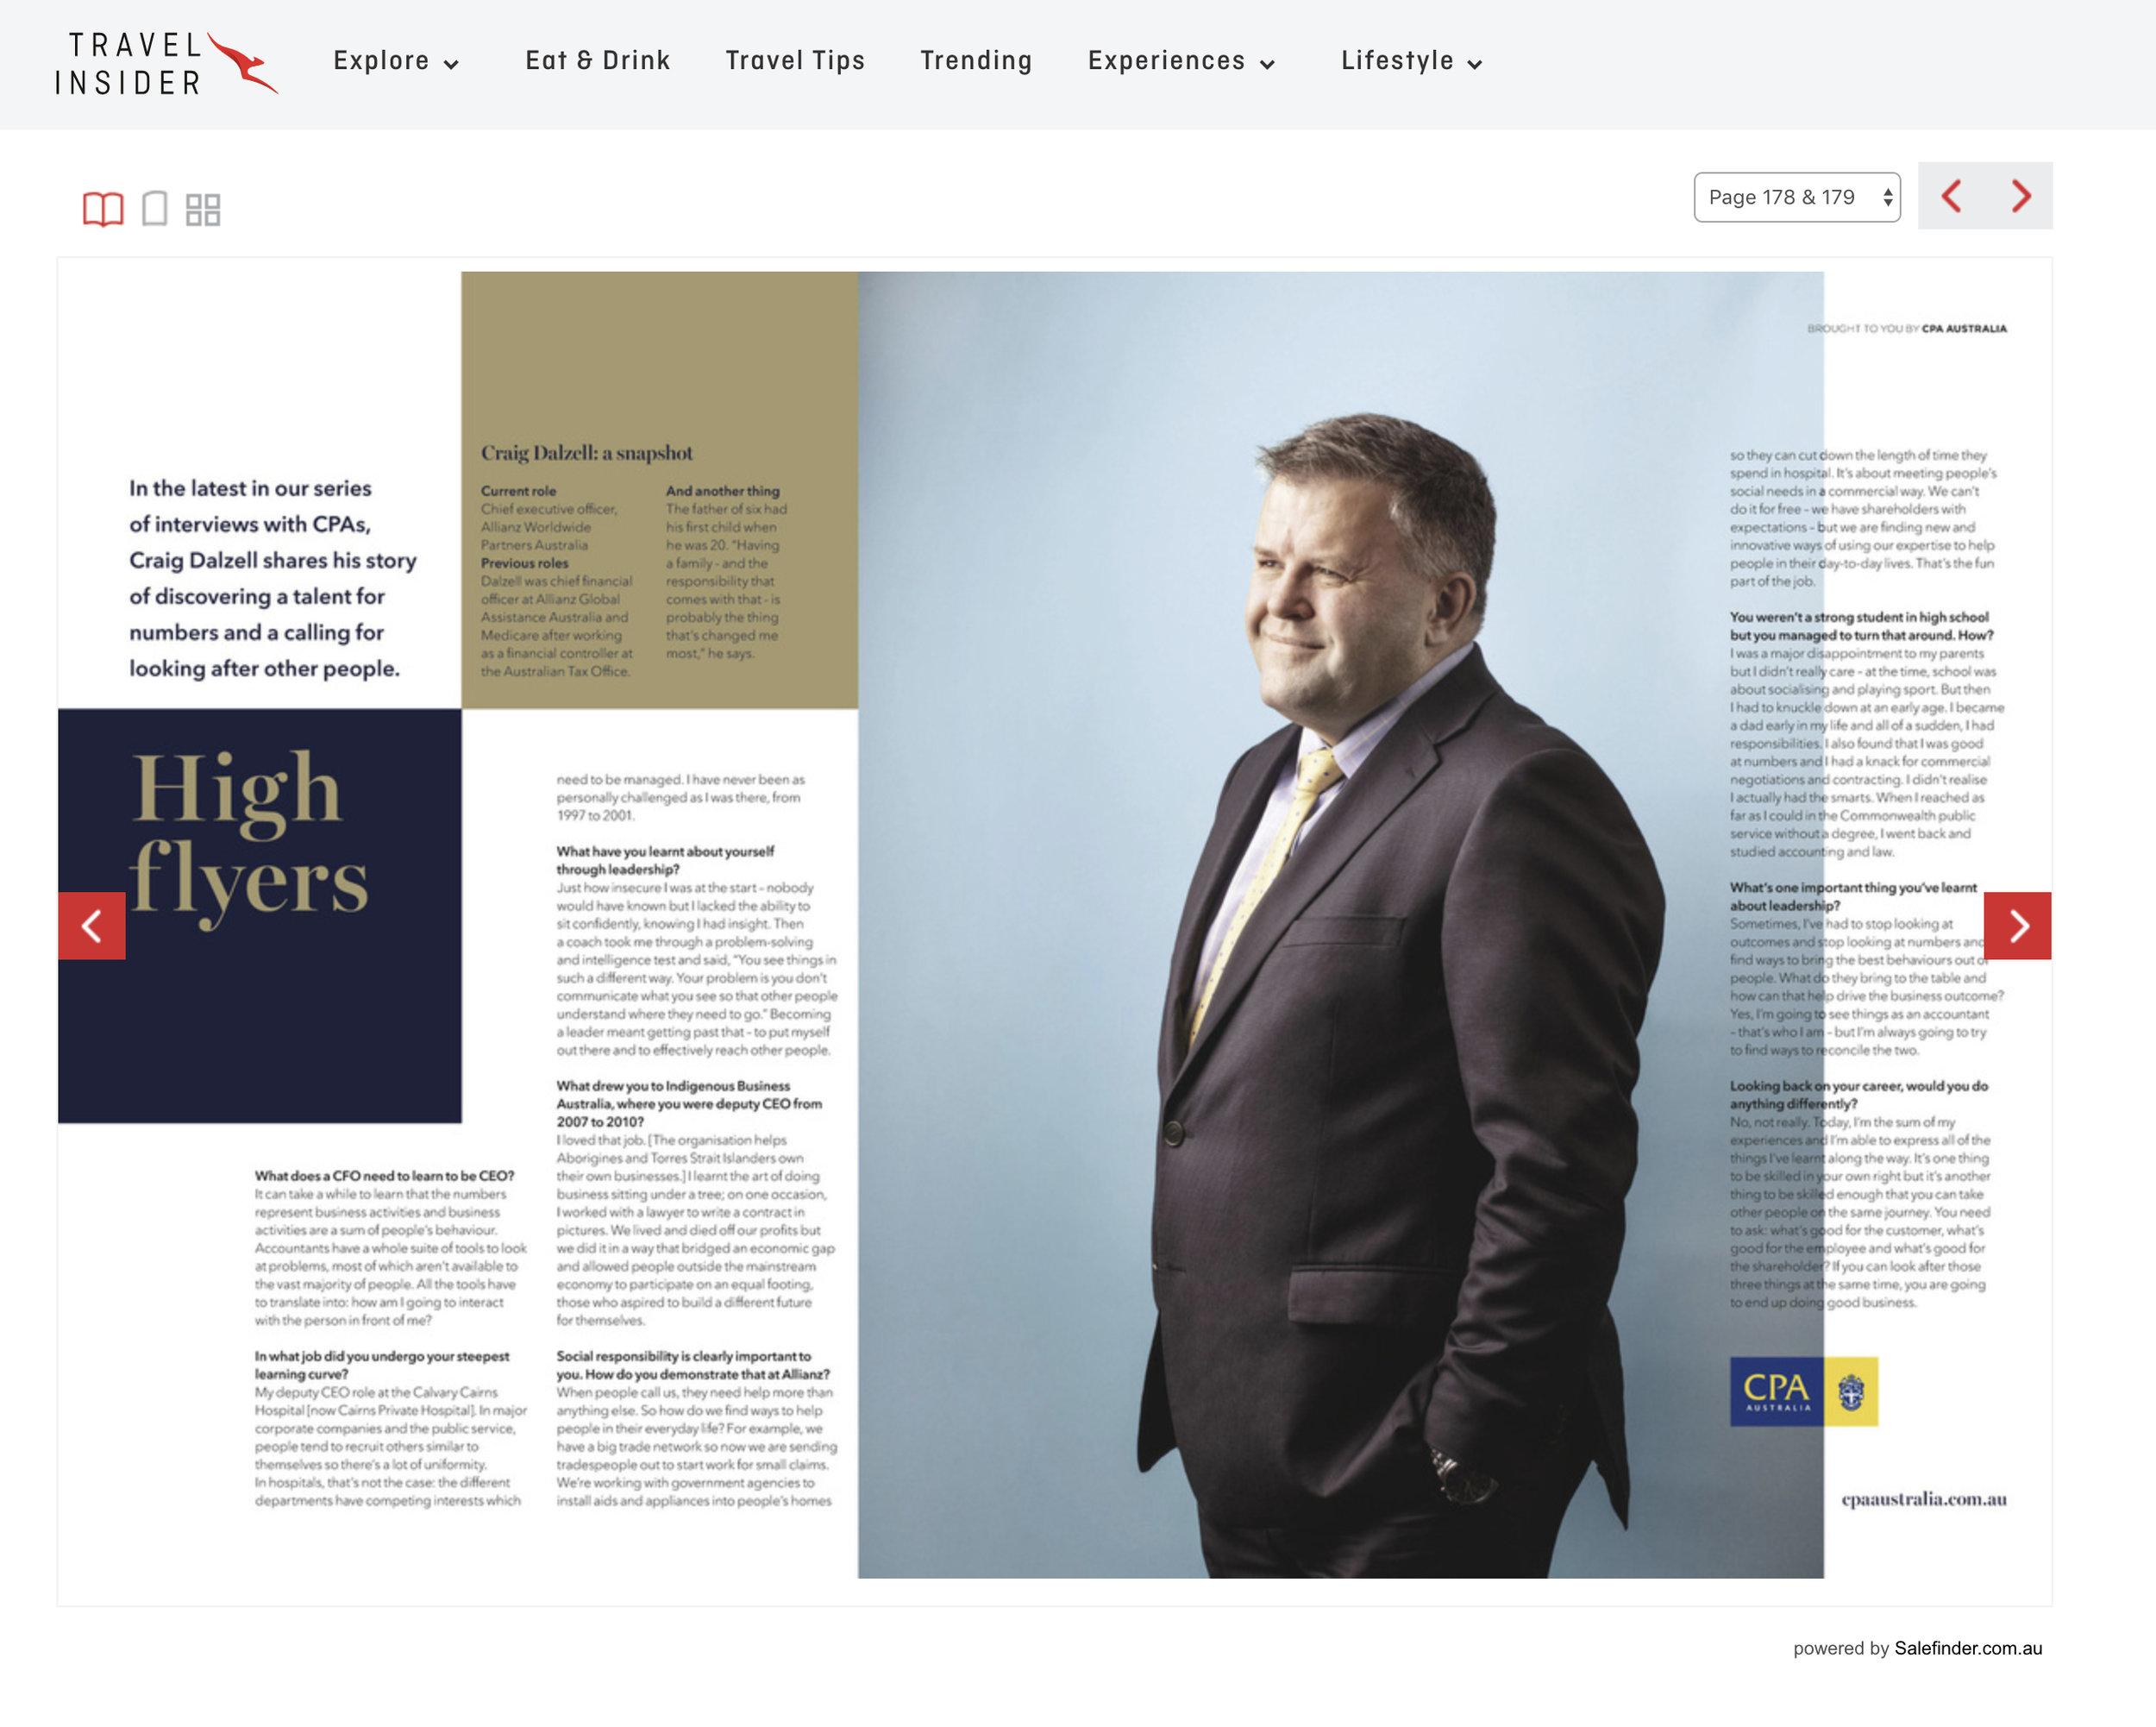 Craig Dalzell for Qantas Magazine